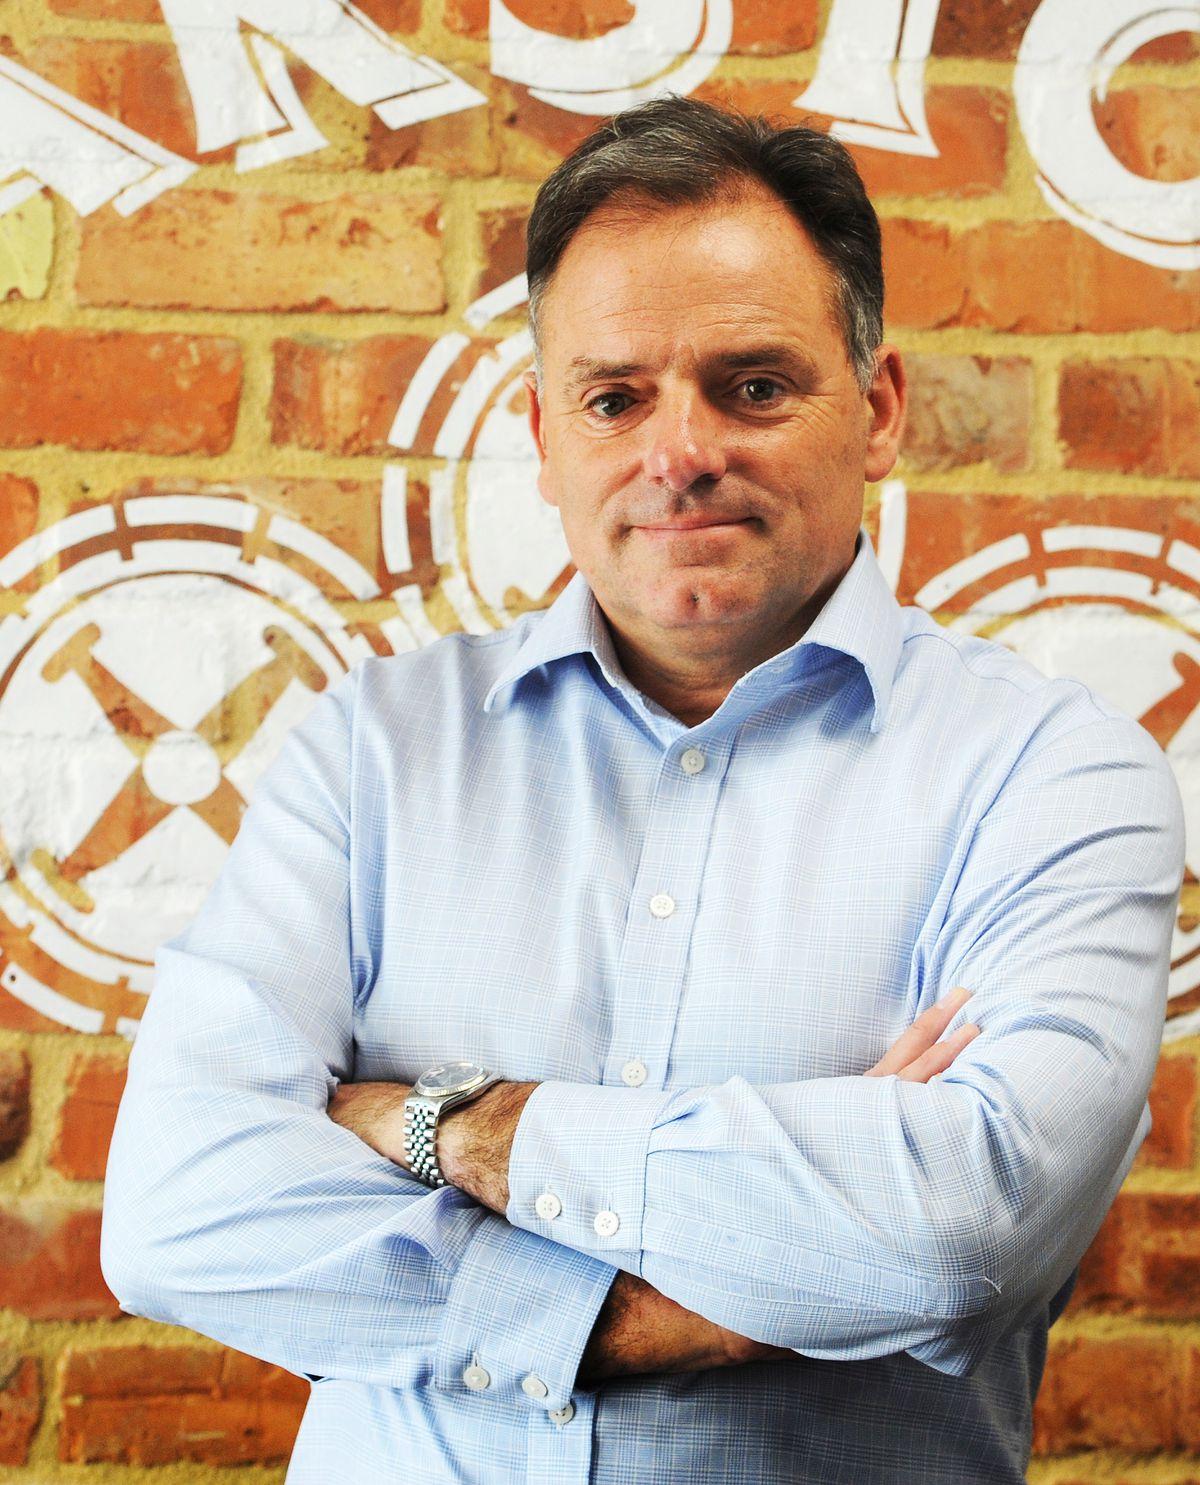 Marston's chief executive Ralph Findlay